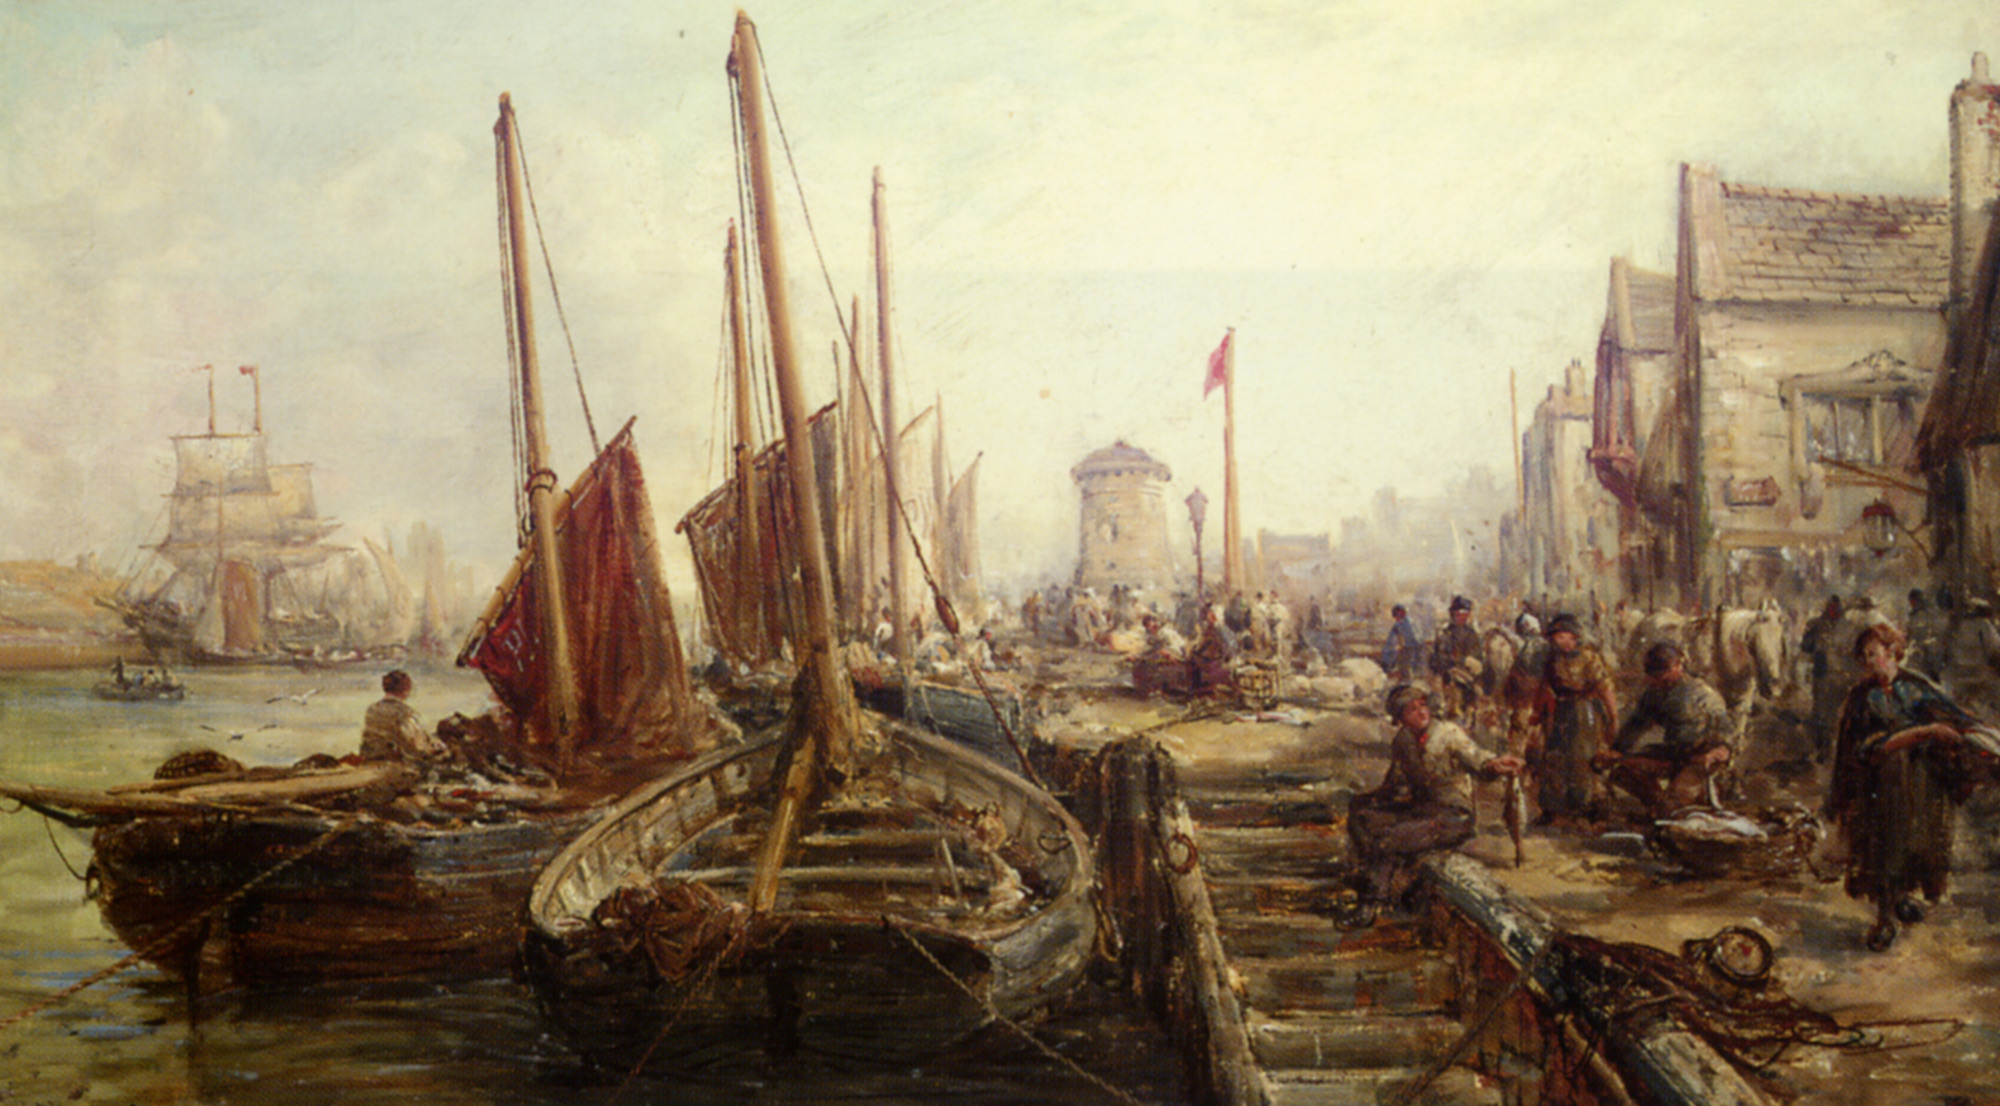 Peel Harbour Isle of Man :: William Edward Webb - Sea landscapes with boats ôîòî